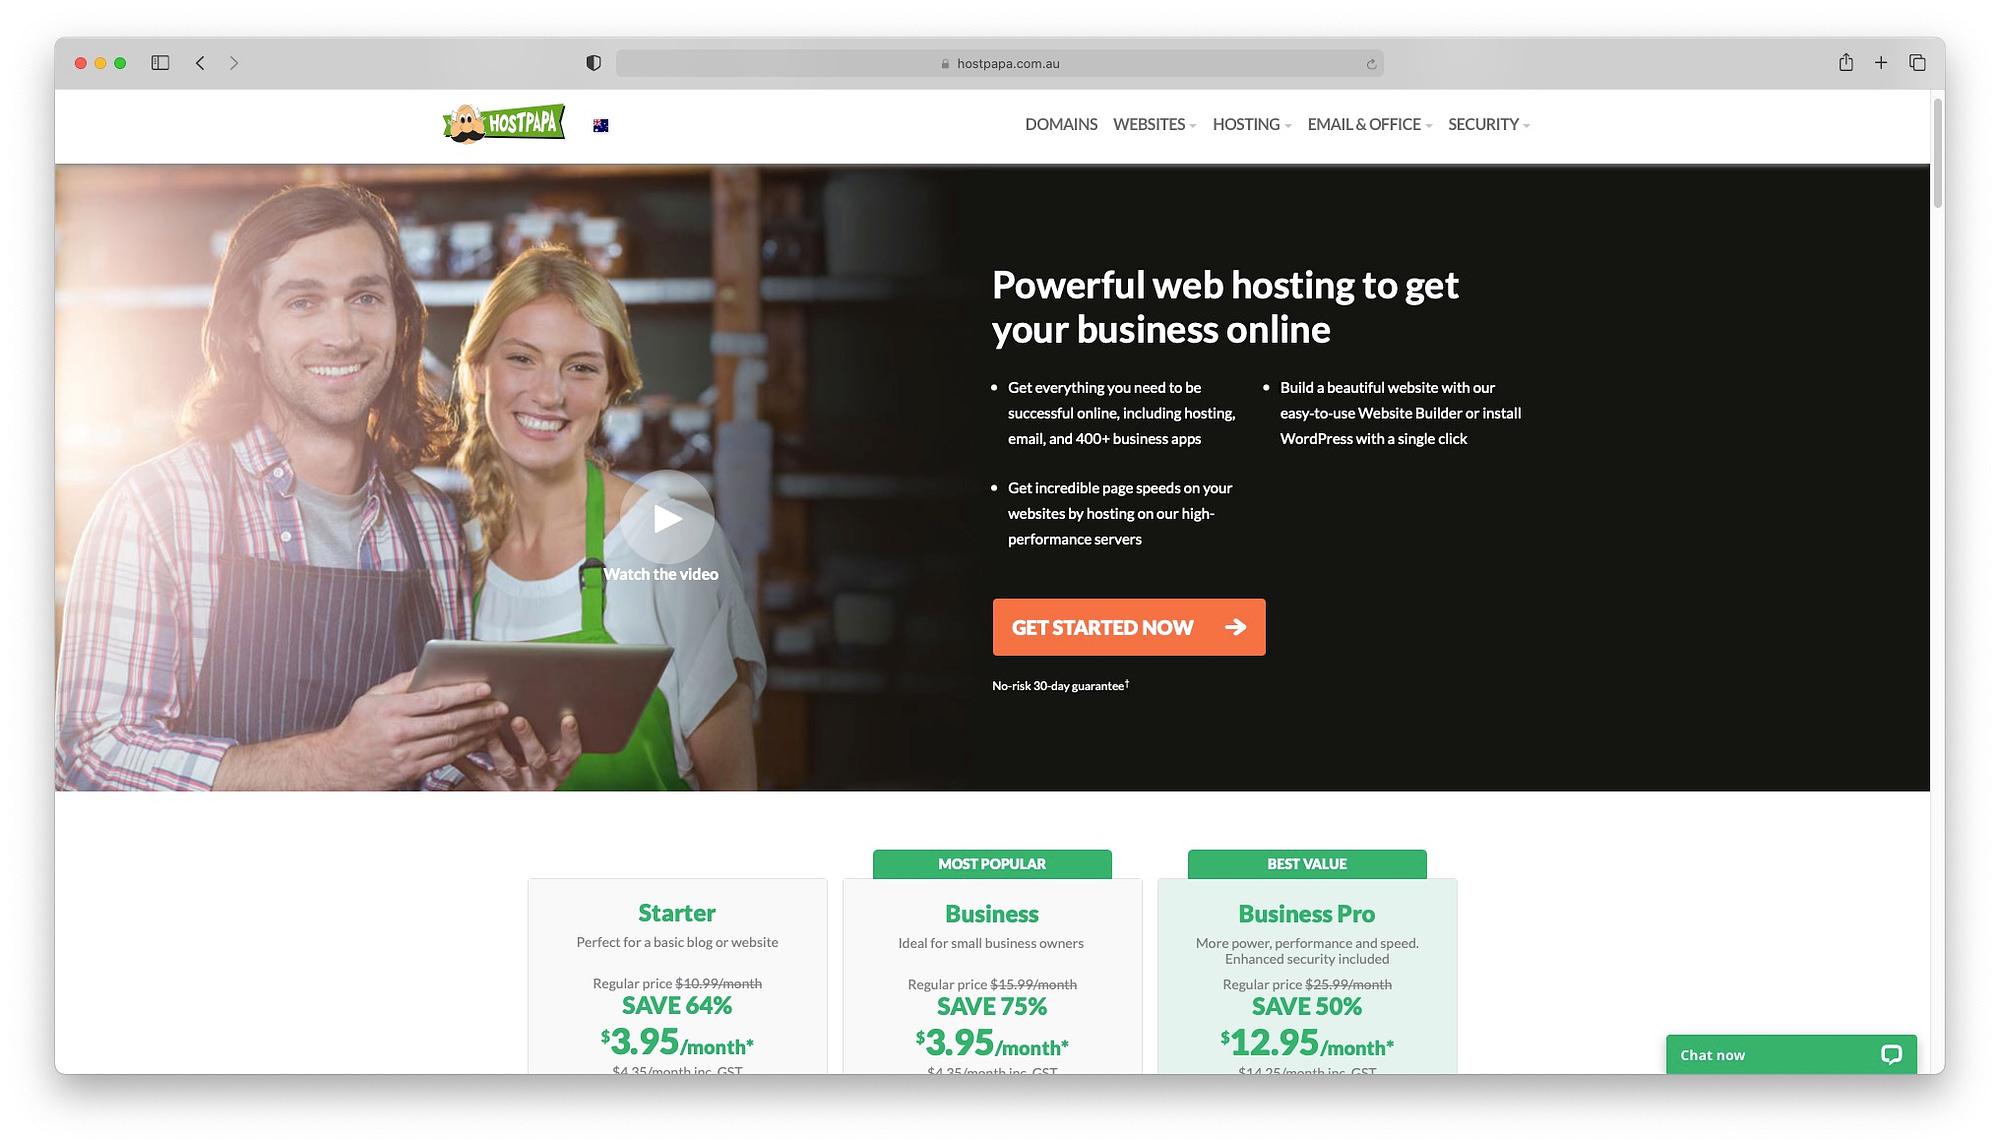 One of the best cheap web hosting Australia offers HostPapa